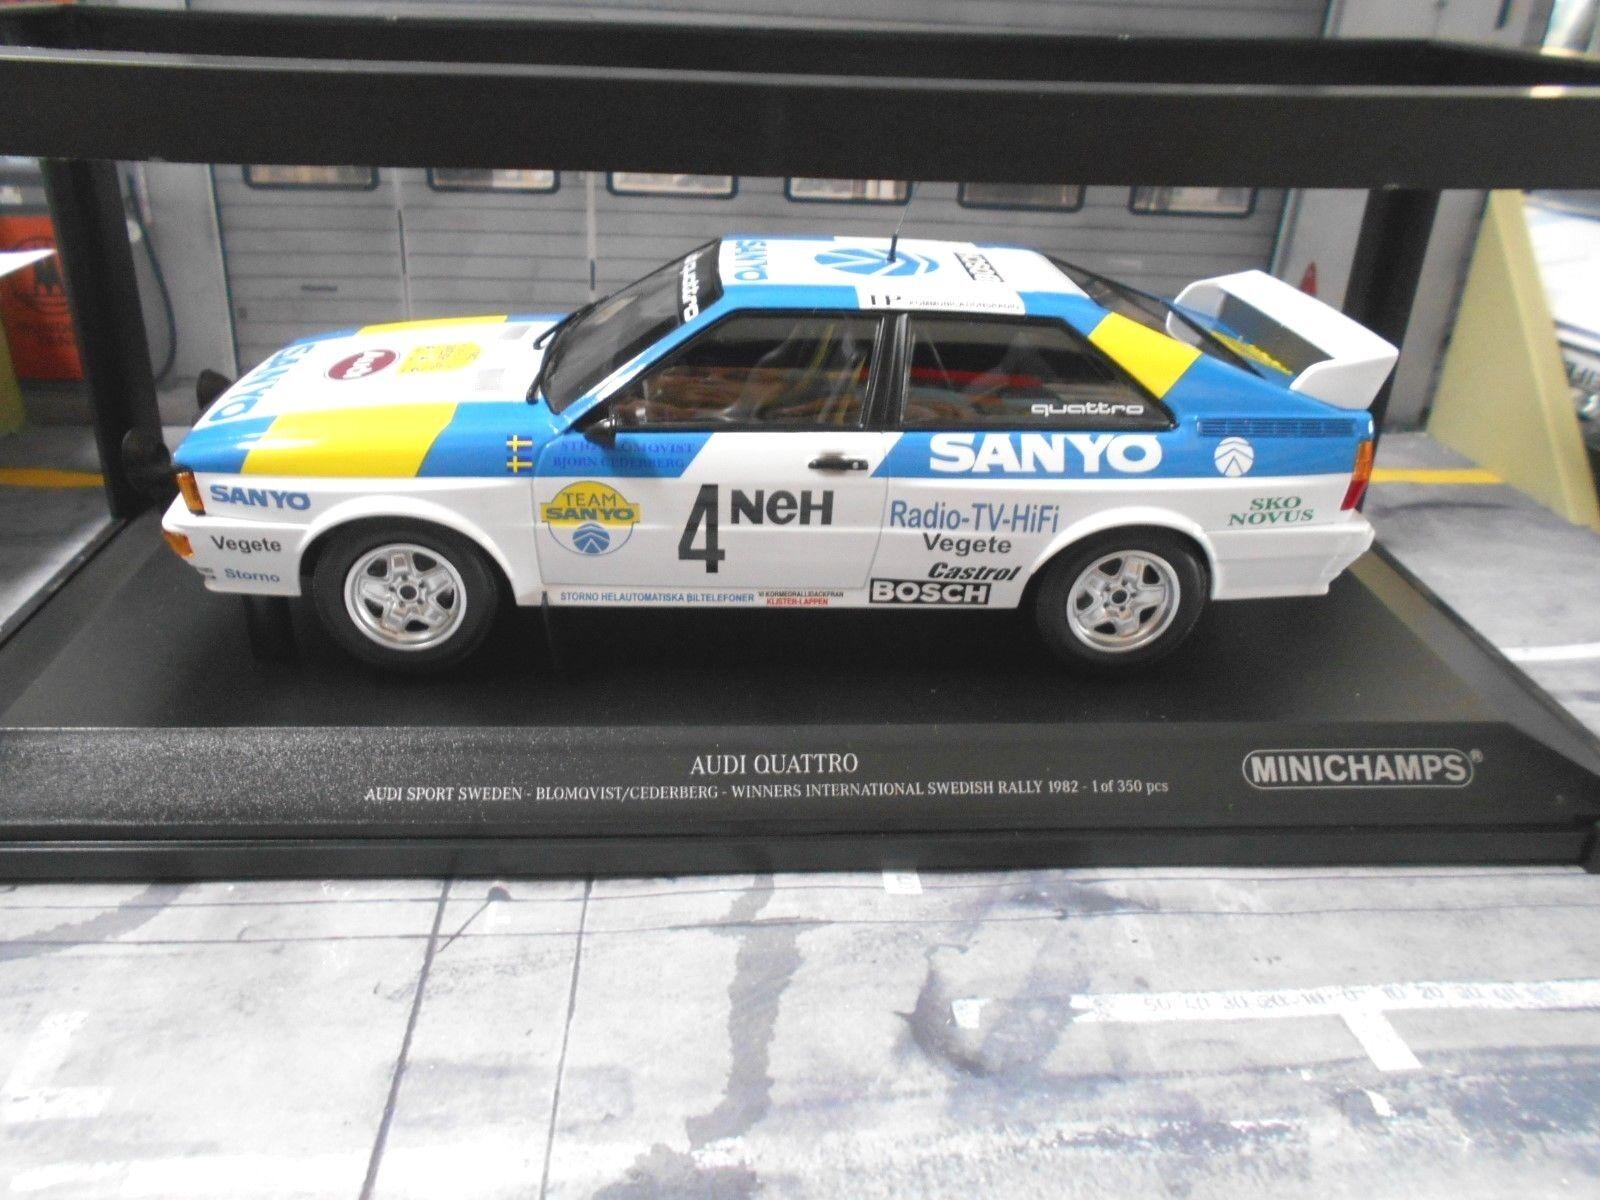 AUDI QUATTRO RALLYE taille taille taille 4 Suède 1982 Win  4 Blomqvist SANYO MINICHAMPS 1 18 641269